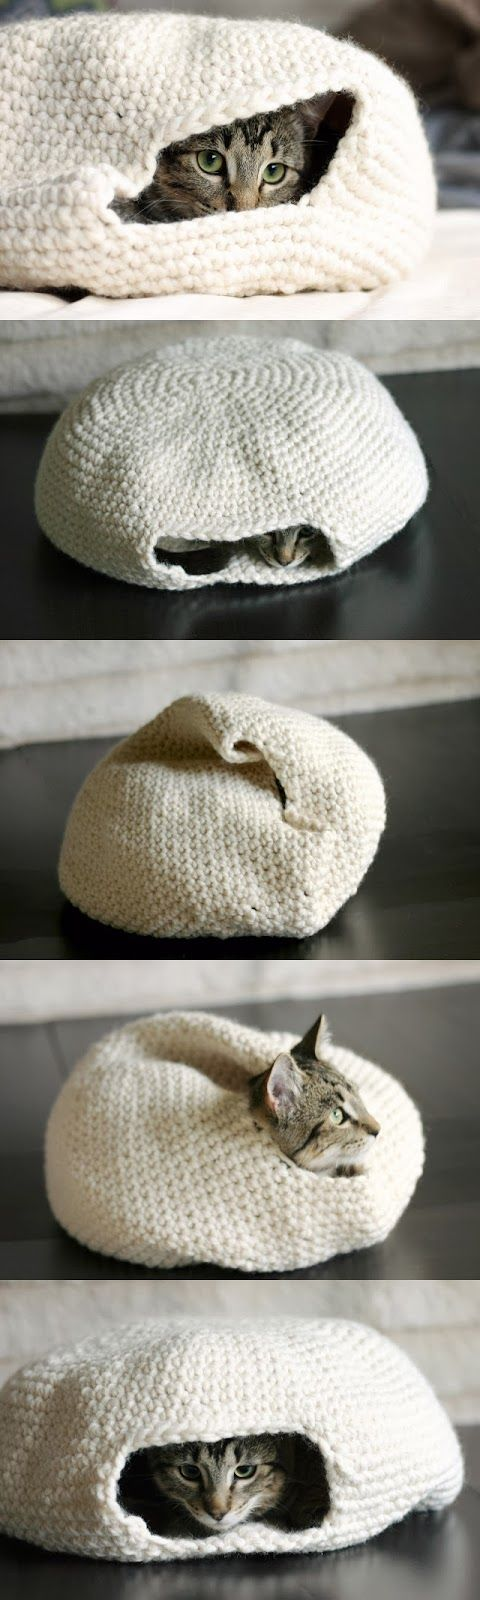 Knitting Patterns For Pet Beds : 25+ best ideas about Crochet cats on Pinterest Crochet cat pattern, Crochet...